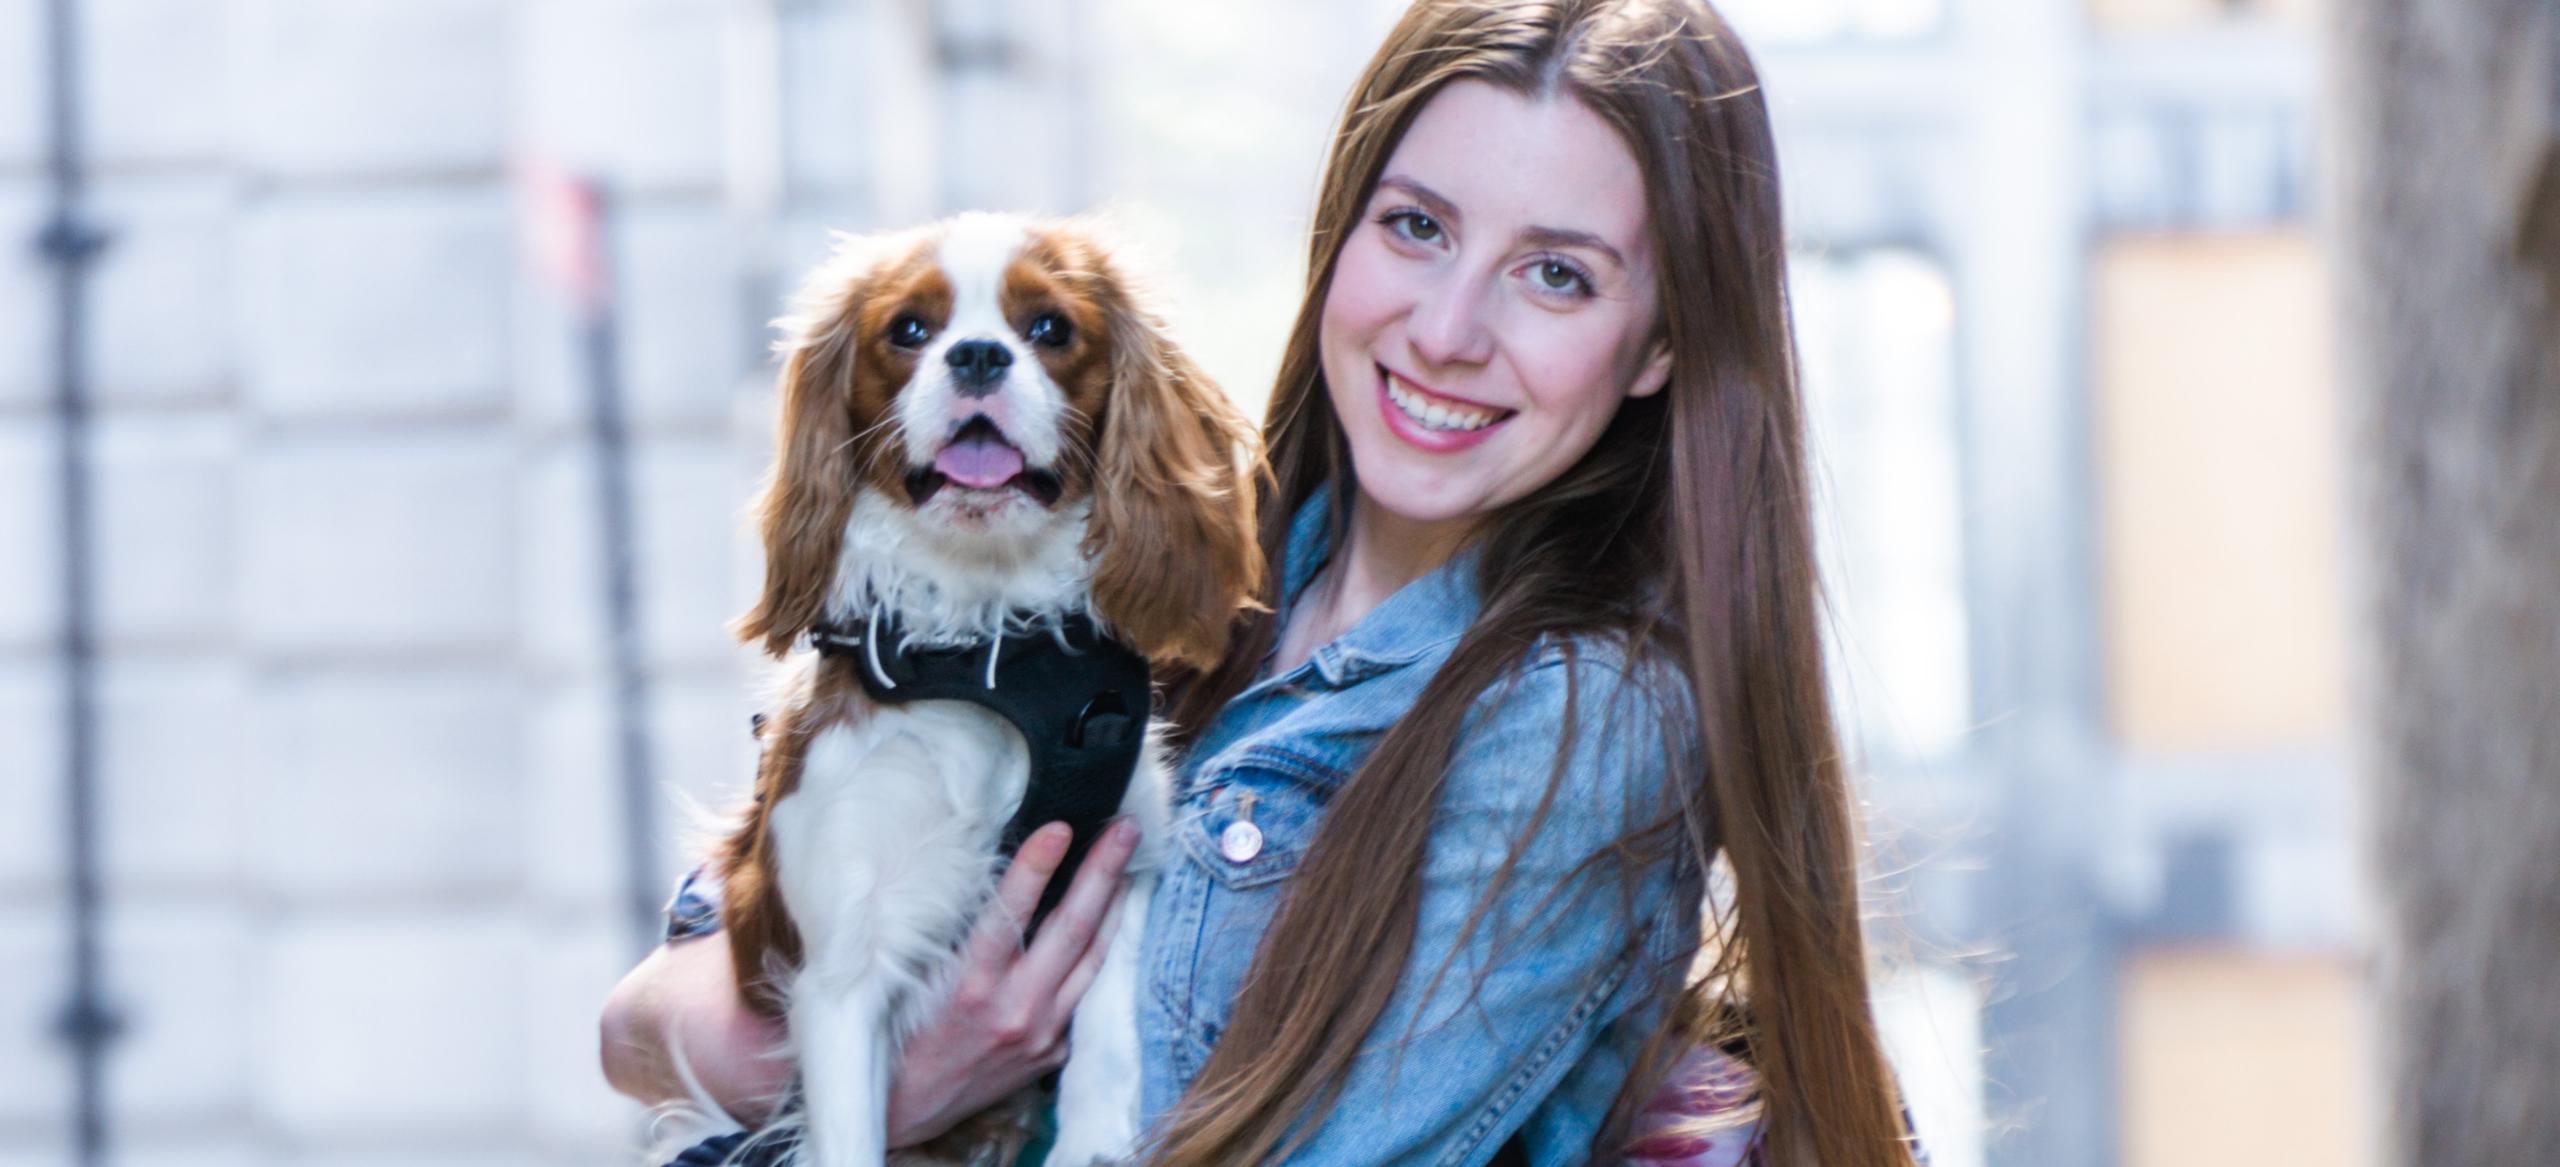 Henry The Smol | Pet Lifestyle Blog | City Dog Living